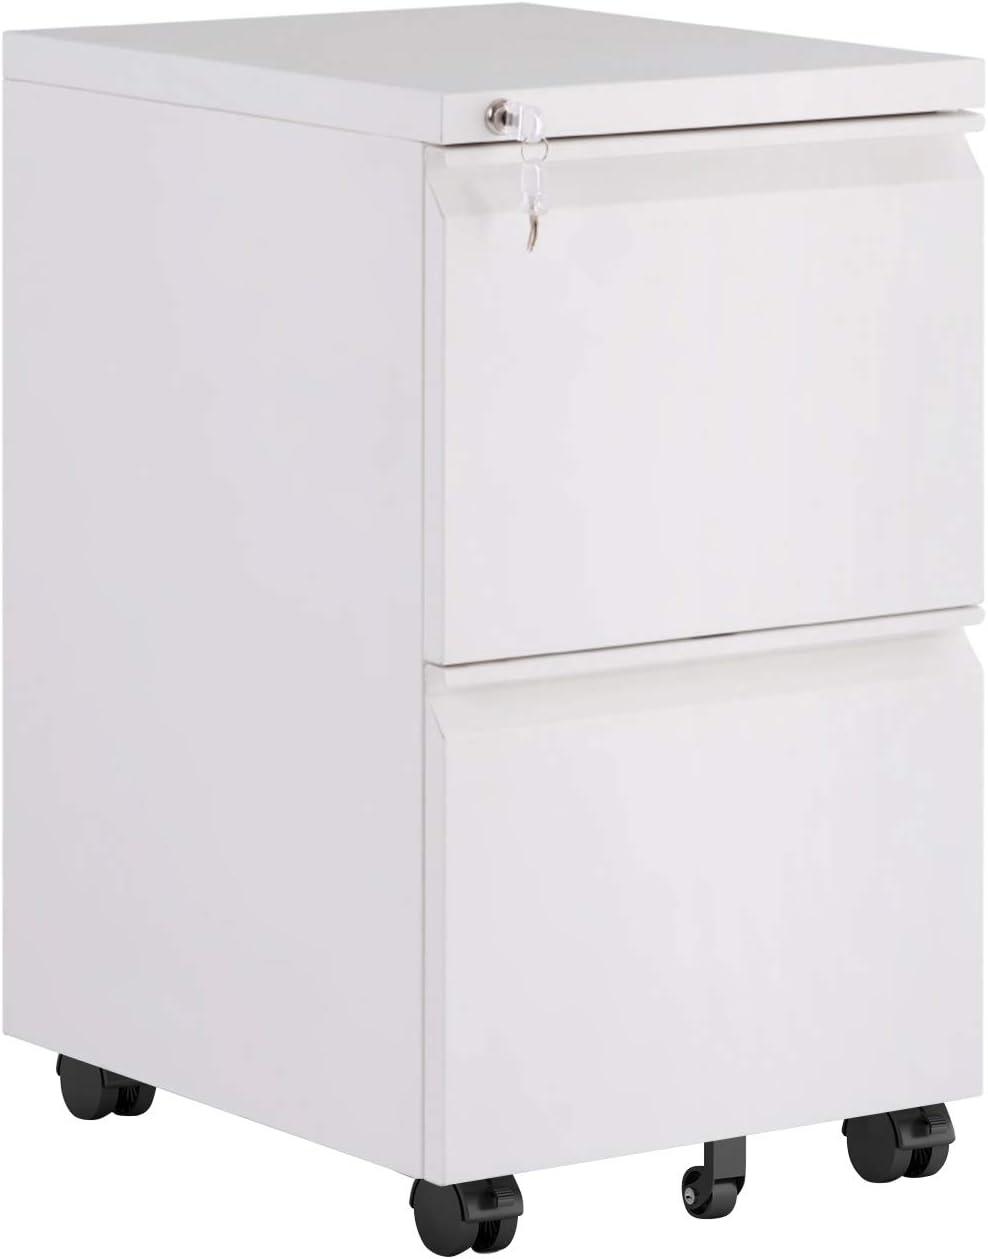 Merax (White) Mobile 2 Drawer Metal Pedestal Under Desk Filing Cabinets with Lock Key 5 Rolling Casters Home Office Modern Vertical Hanging Folders A4 Letter Size